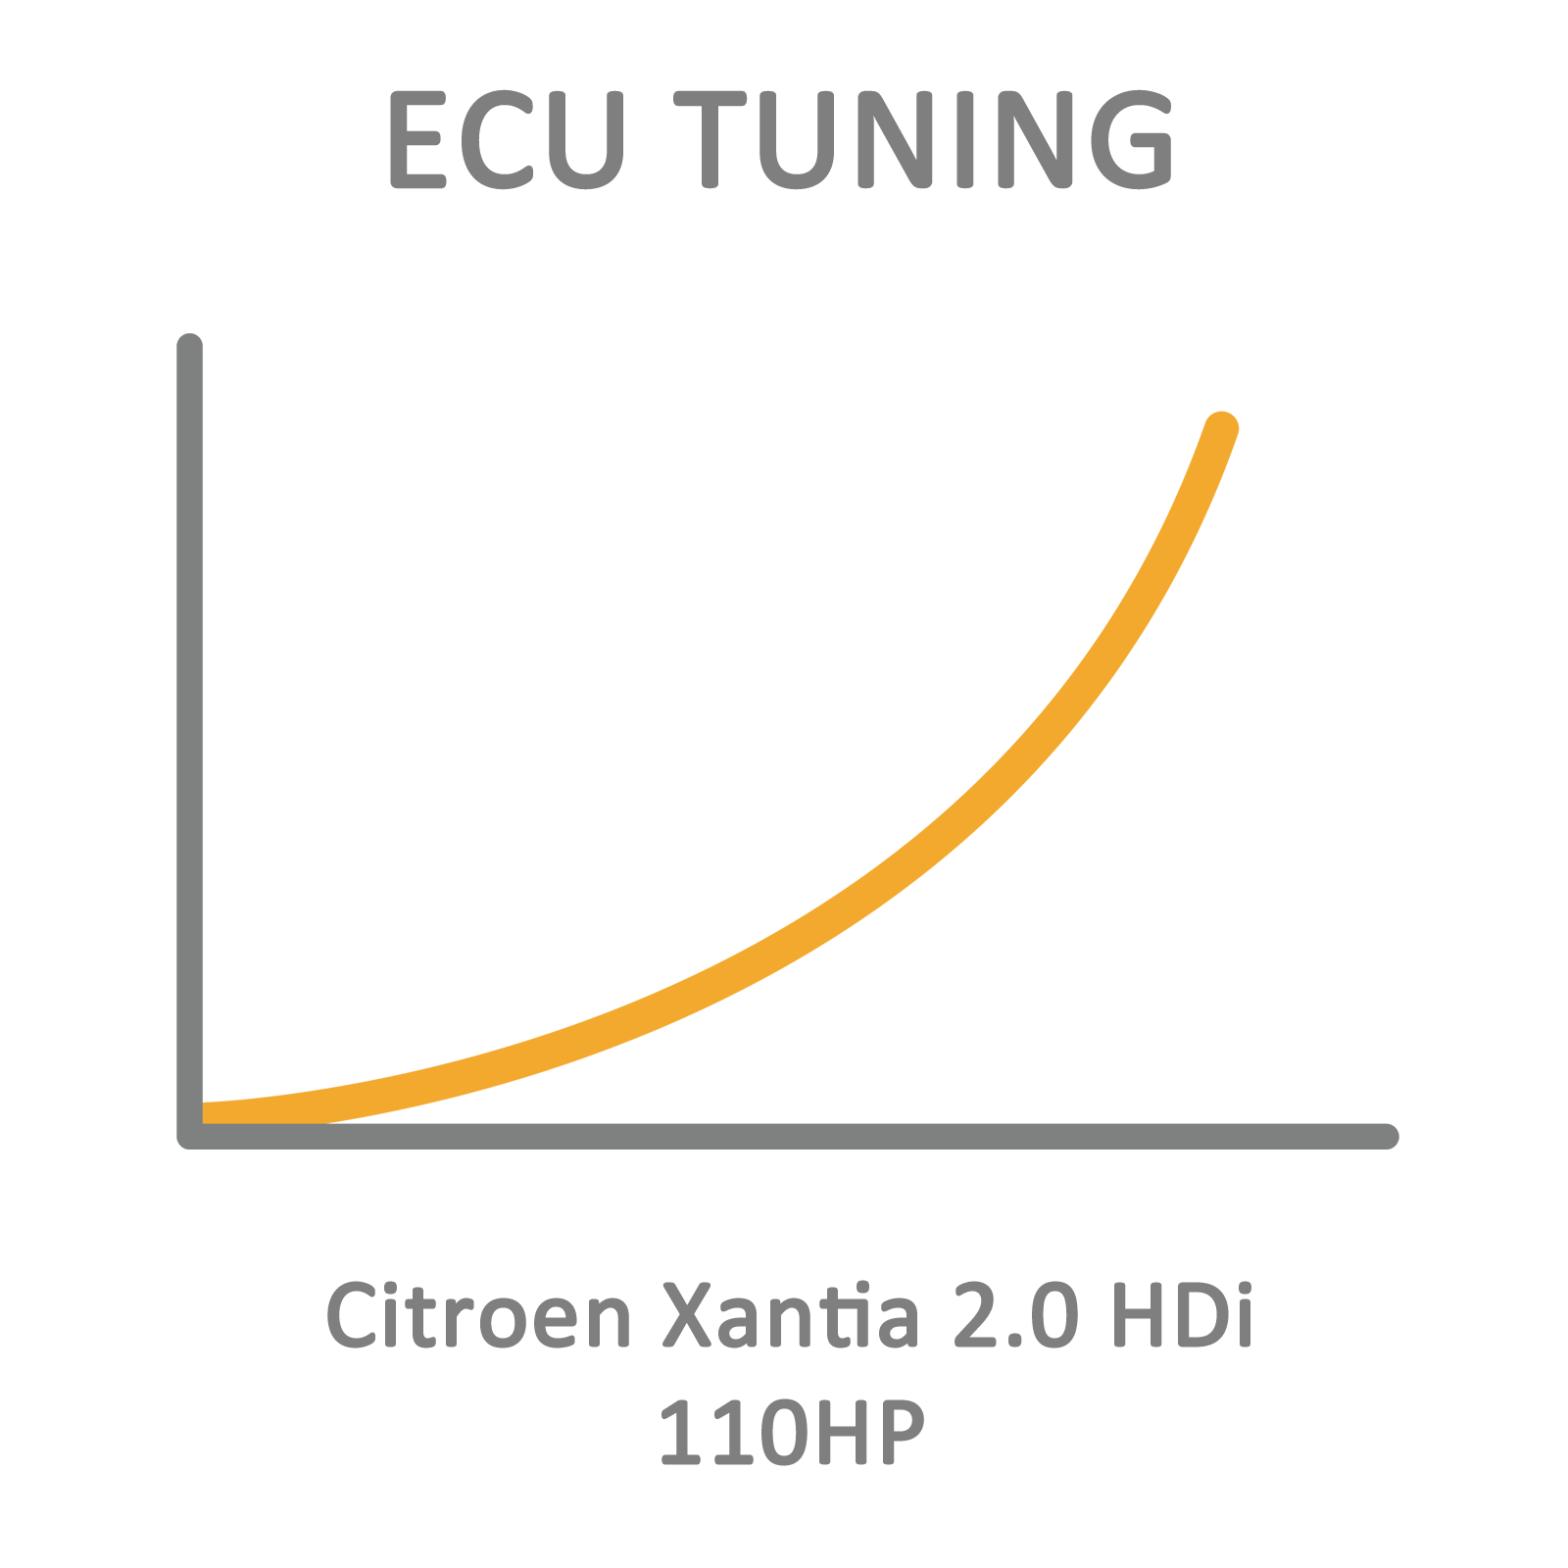 Citroen Xantia 2.0 HDI 110HP ECU Tuning Remapping Programming